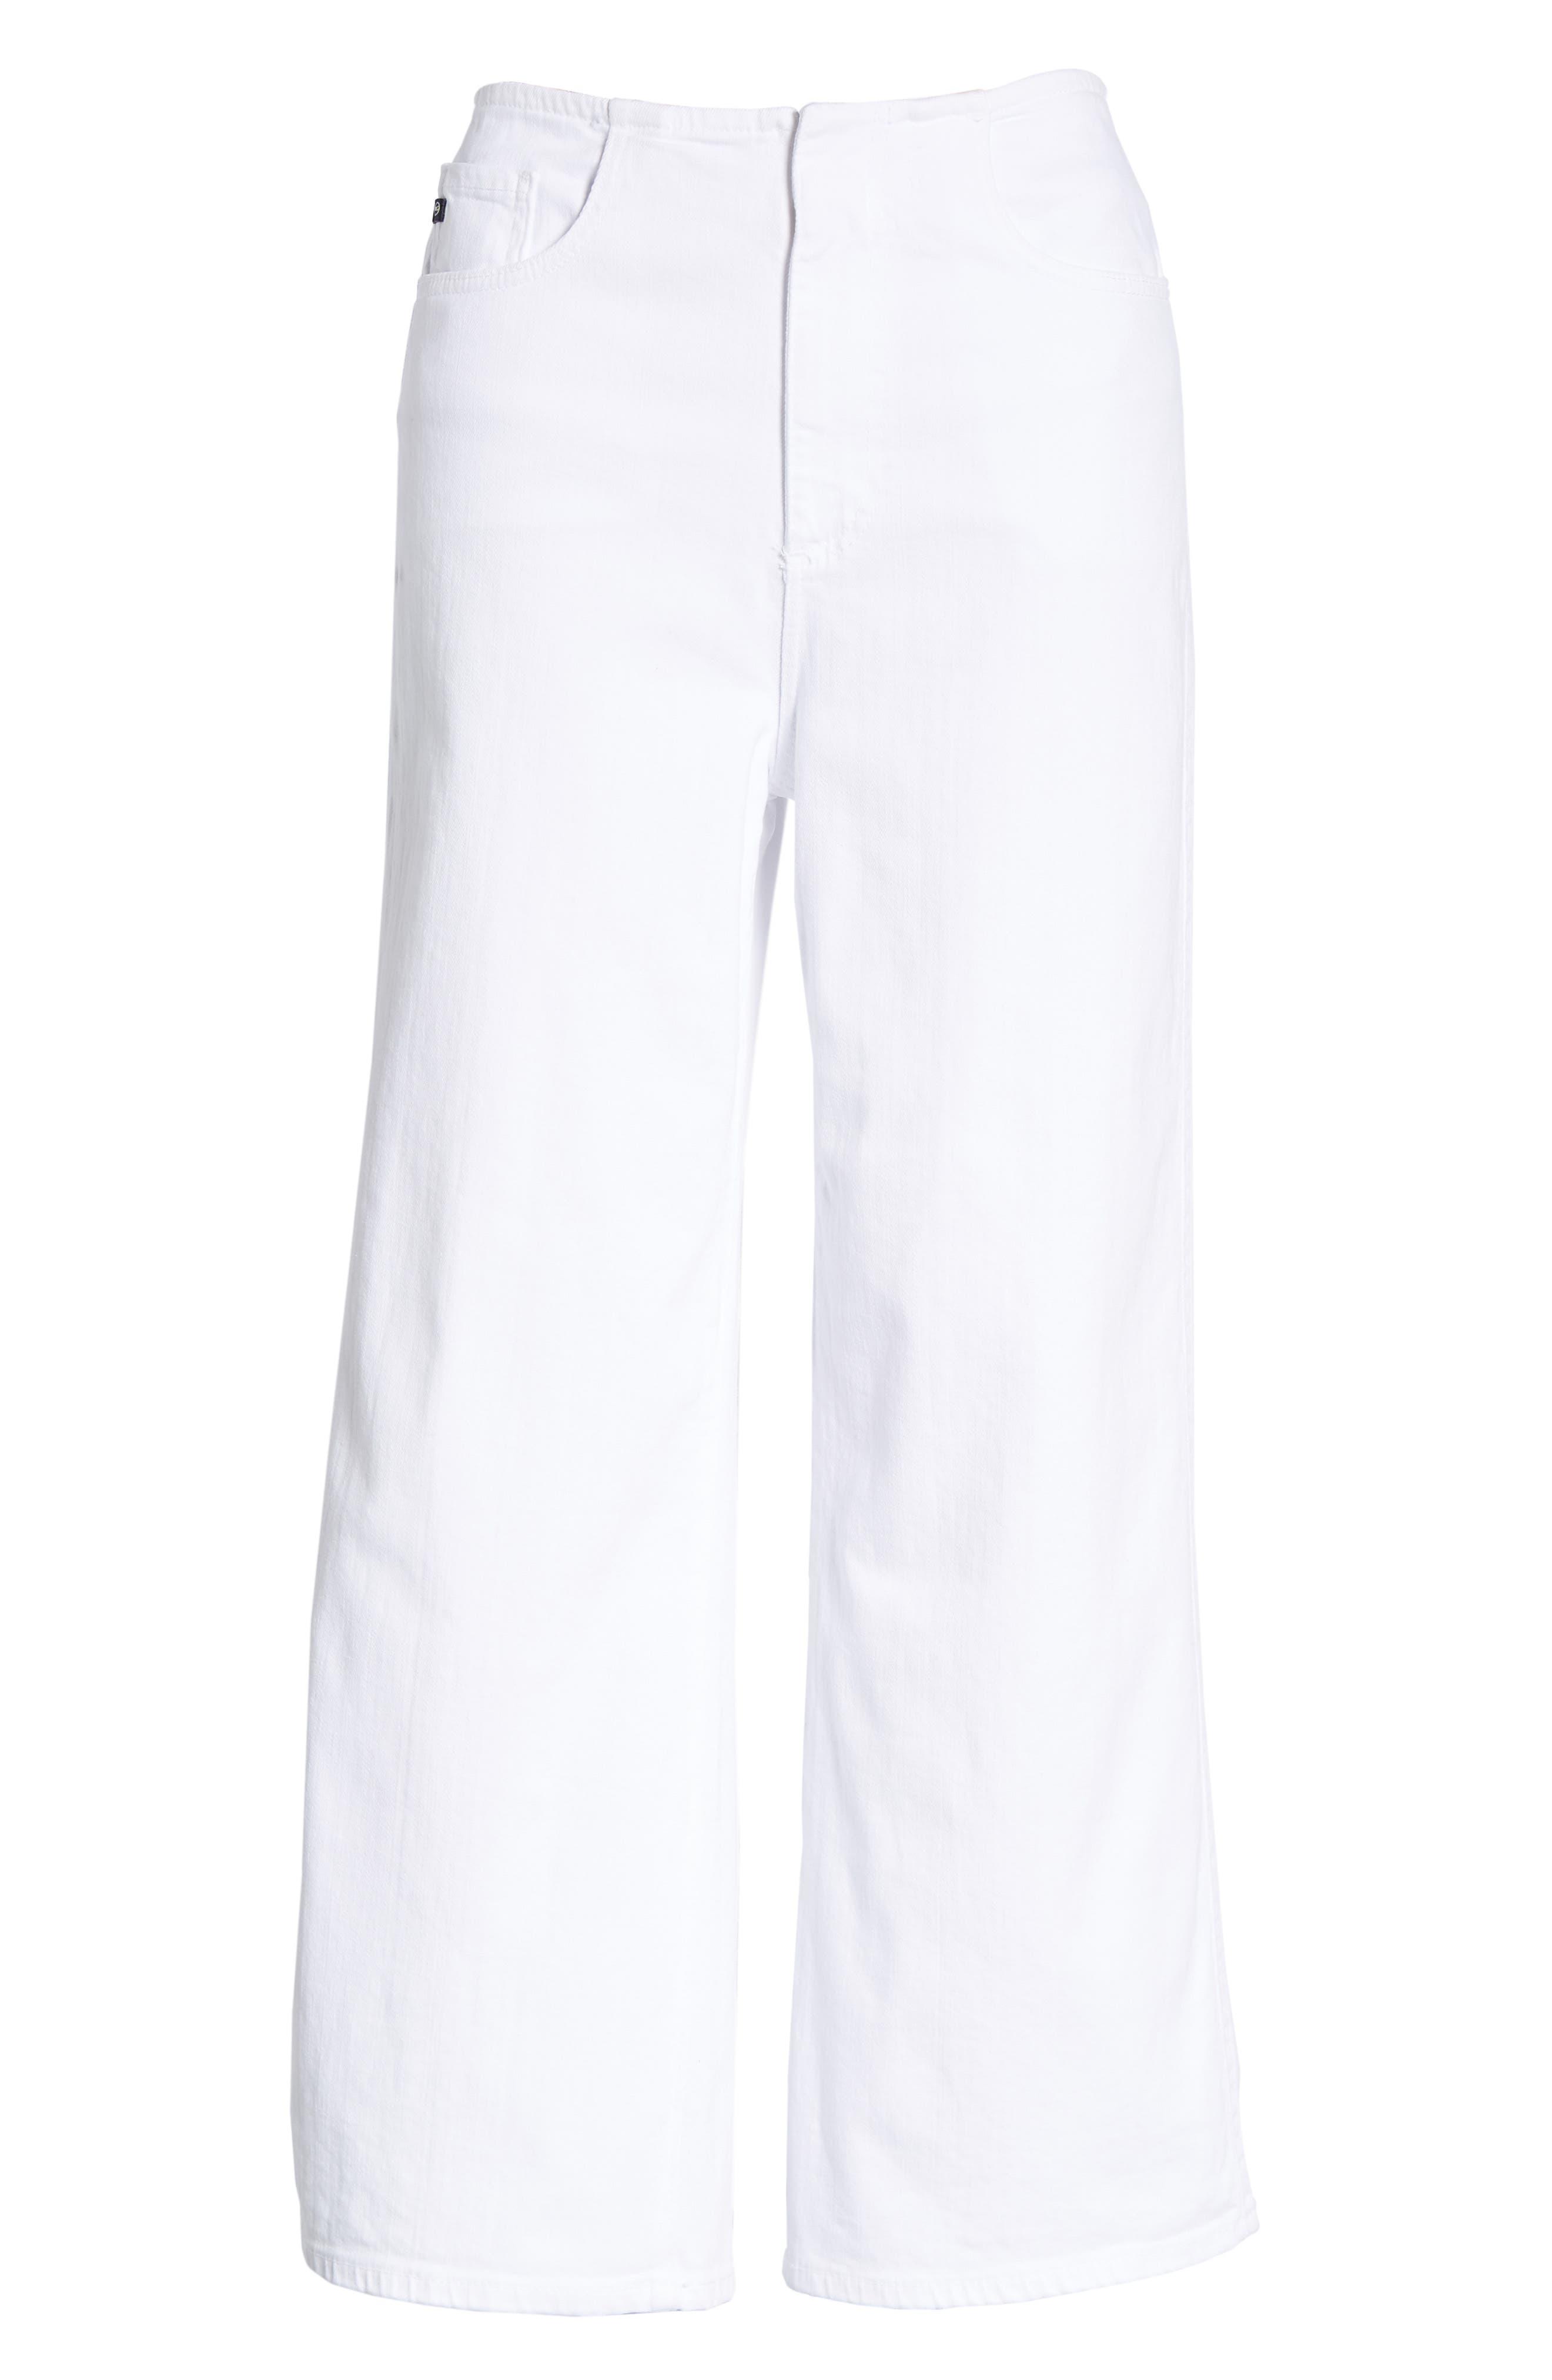 Etta High Waist Crop Wide Leg Jeans,                             Alternate thumbnail 7, color,                             White